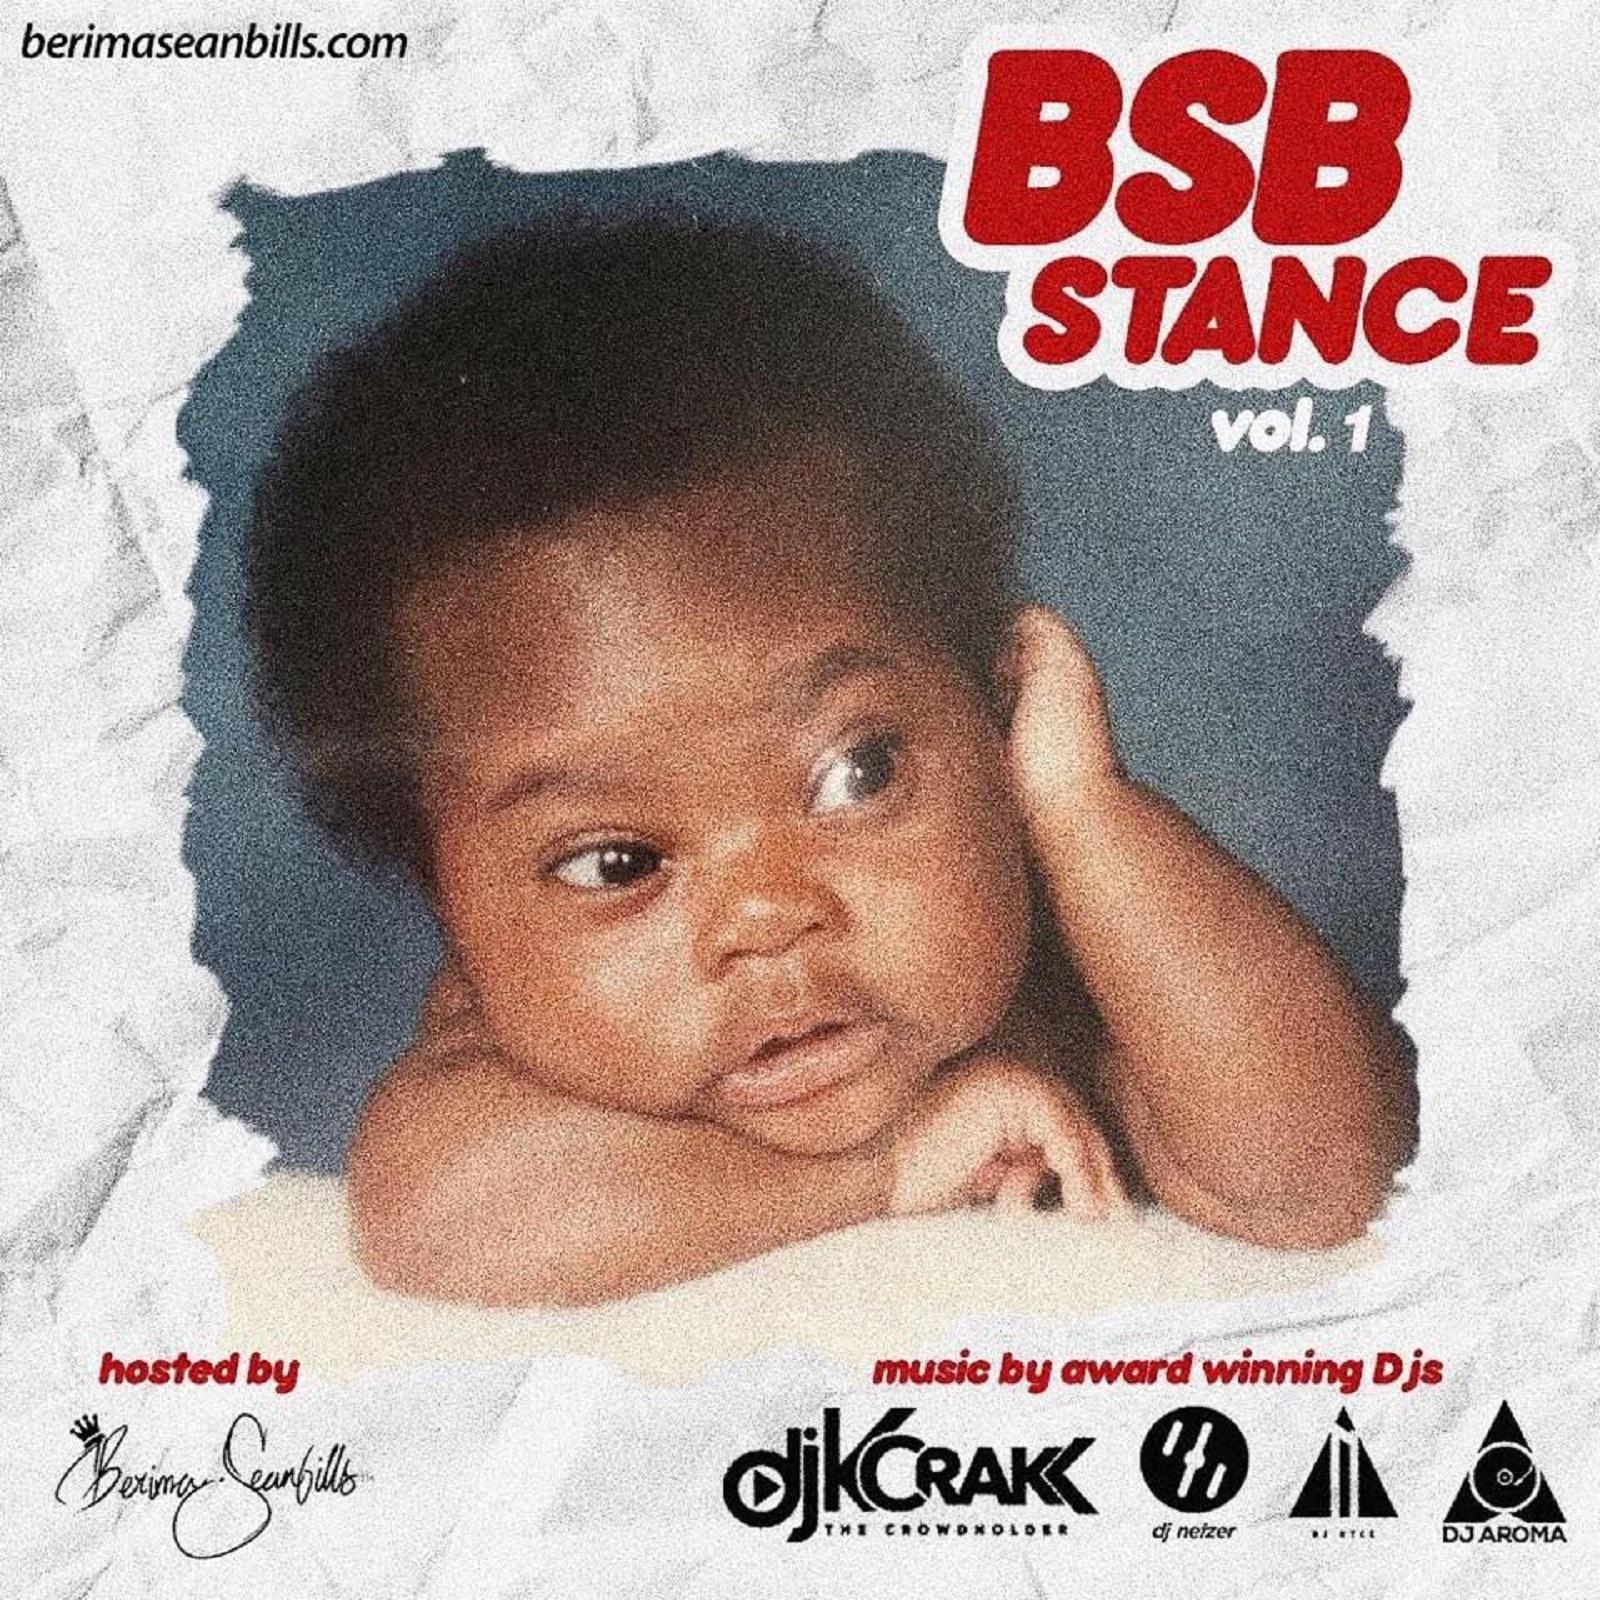 BSB STANCE VOL. 1 by Berima Seanbills